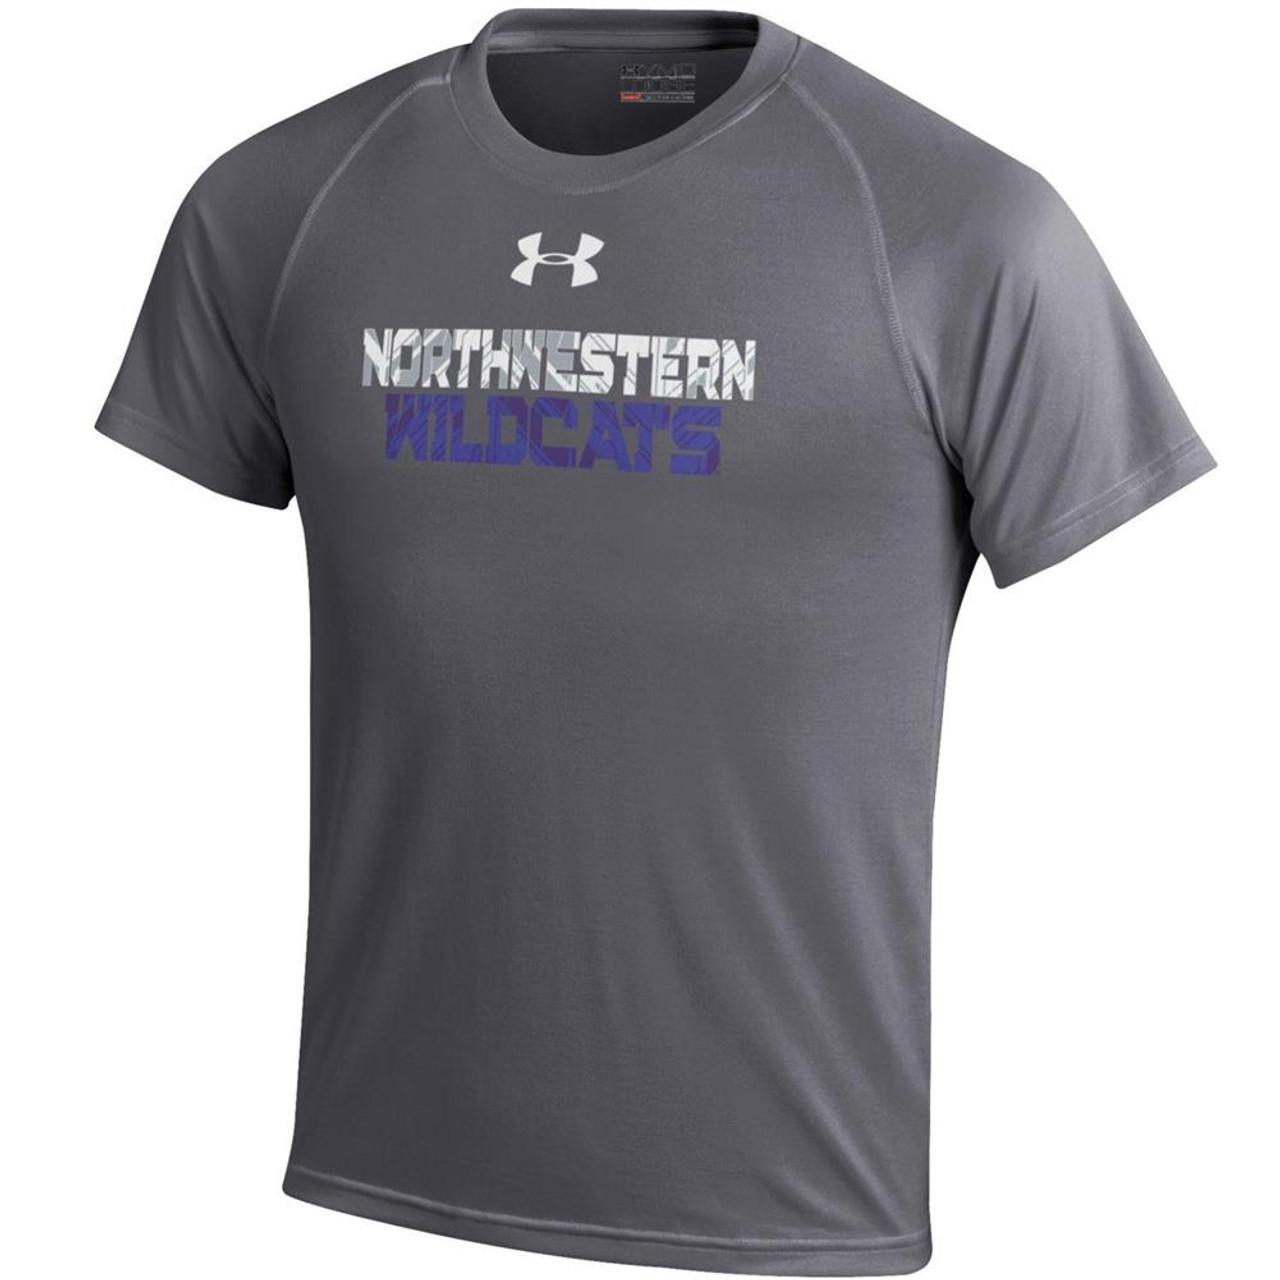 Boy's NuTech Short Sleeve Northwestern University Under Armour Tee